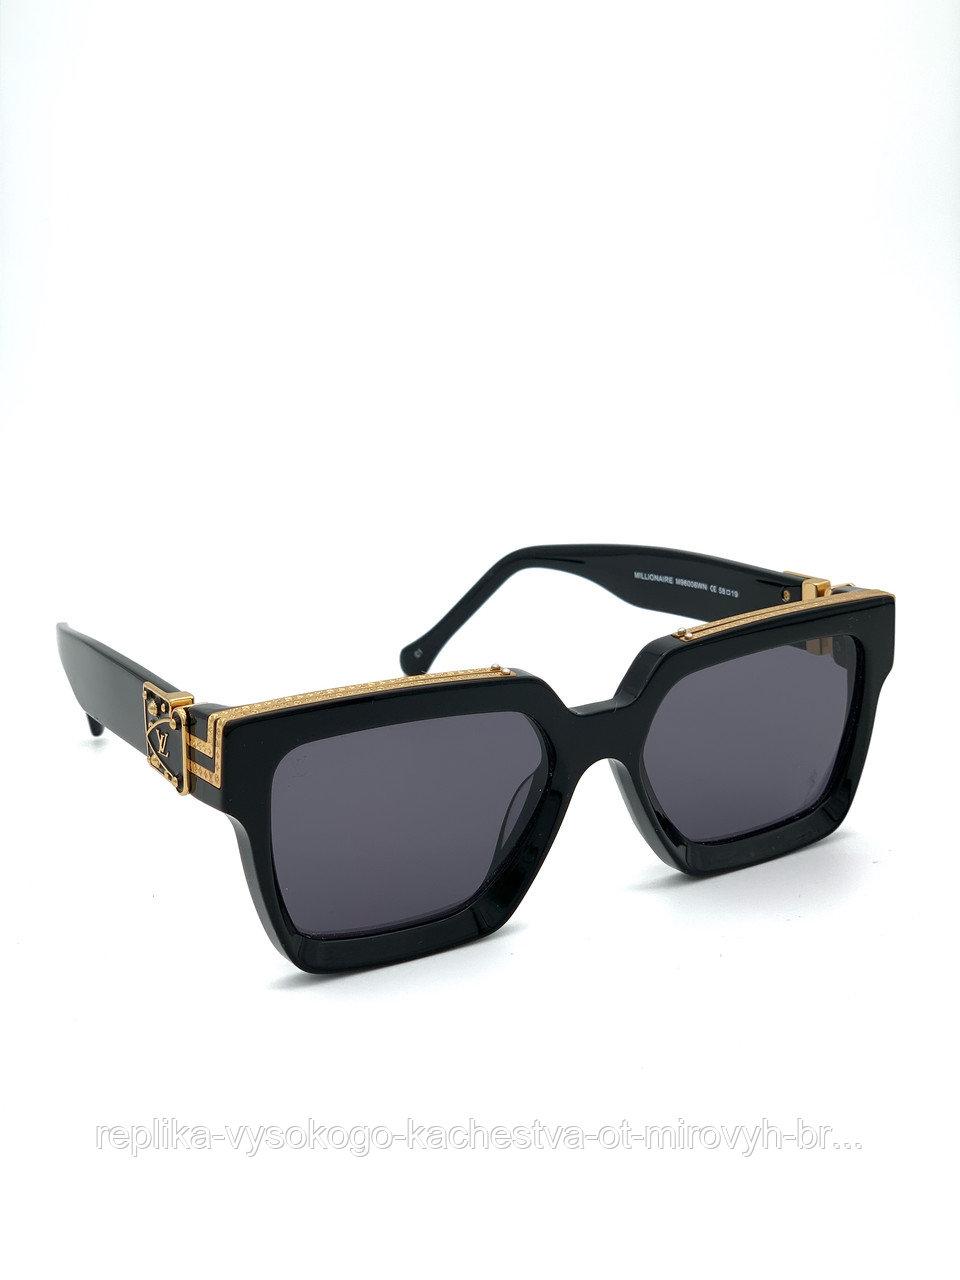 Очки Louis Vuitton 1:1 MILLIONAIRES